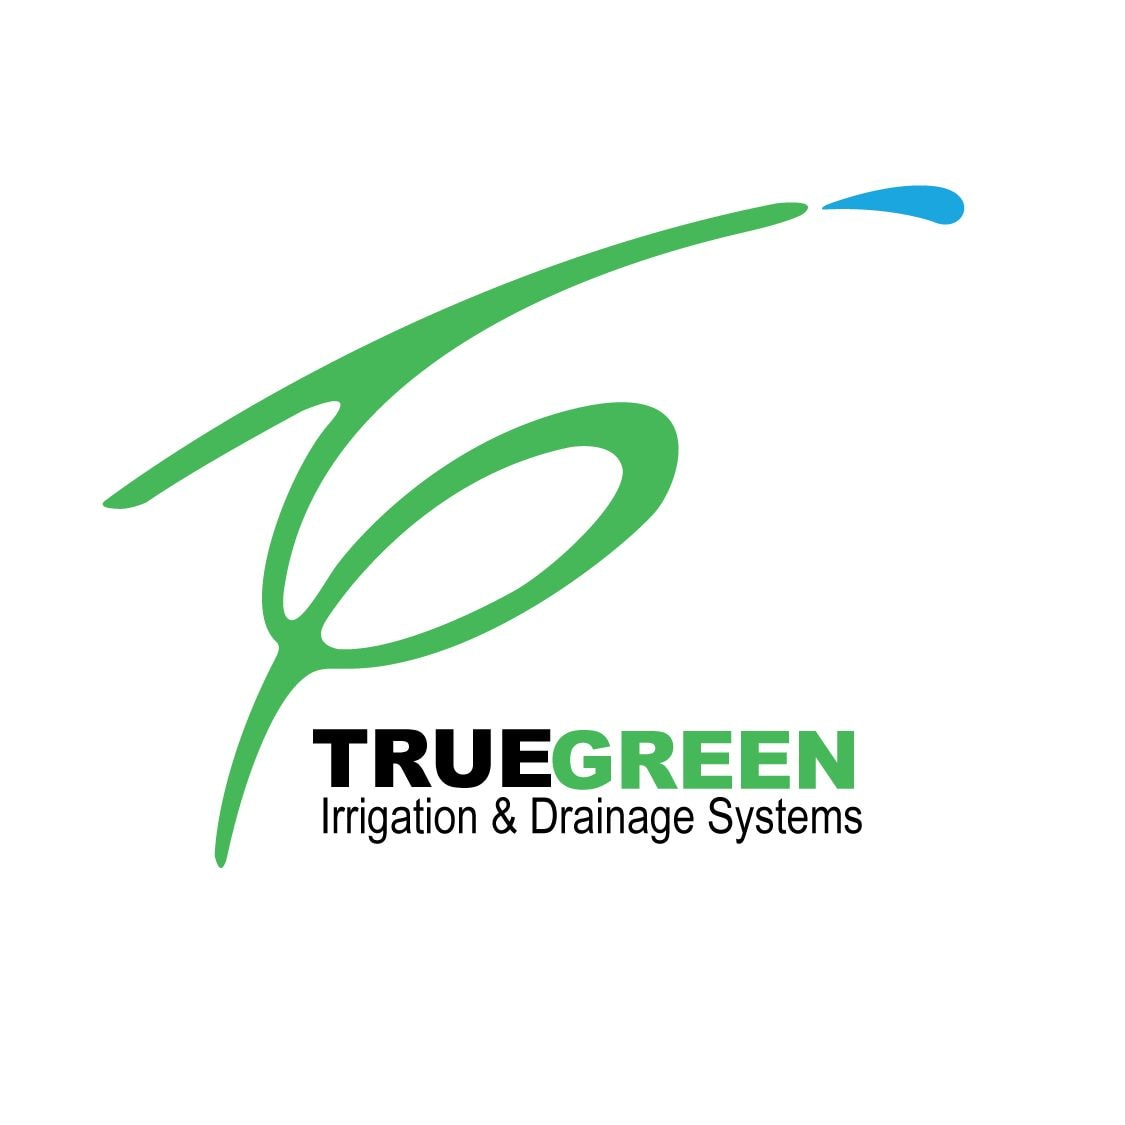 TrueGreen Irrigation